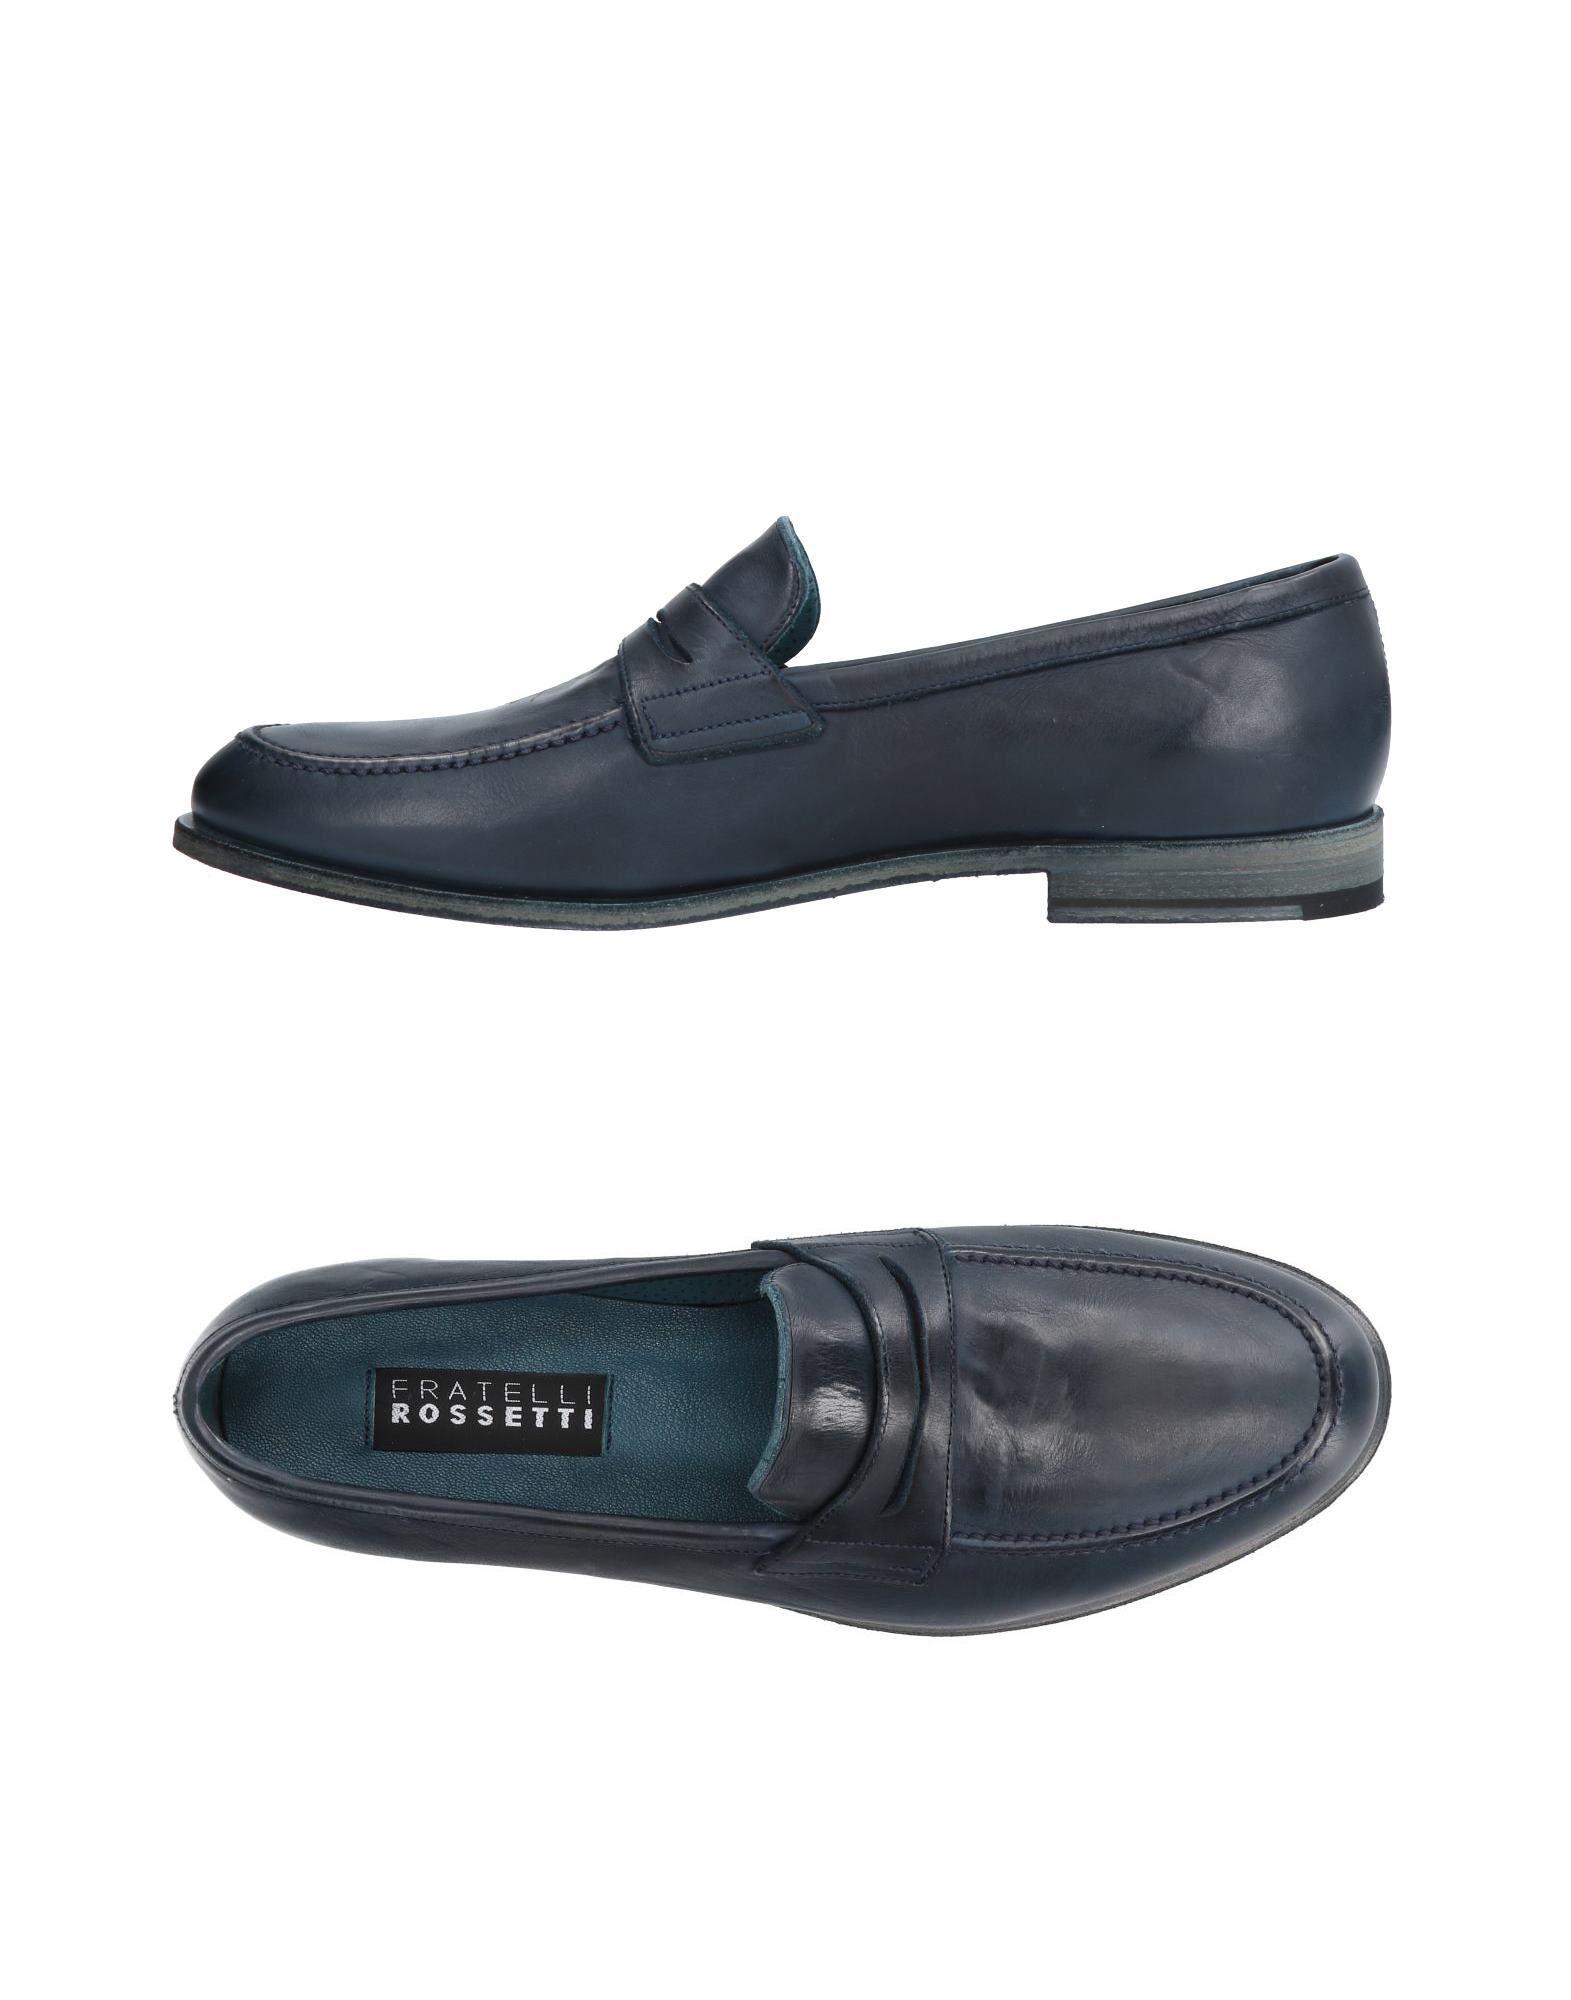 Fratelli Rossetti Mokassins Herren  11440567GM Gute Qualität beliebte Schuhe